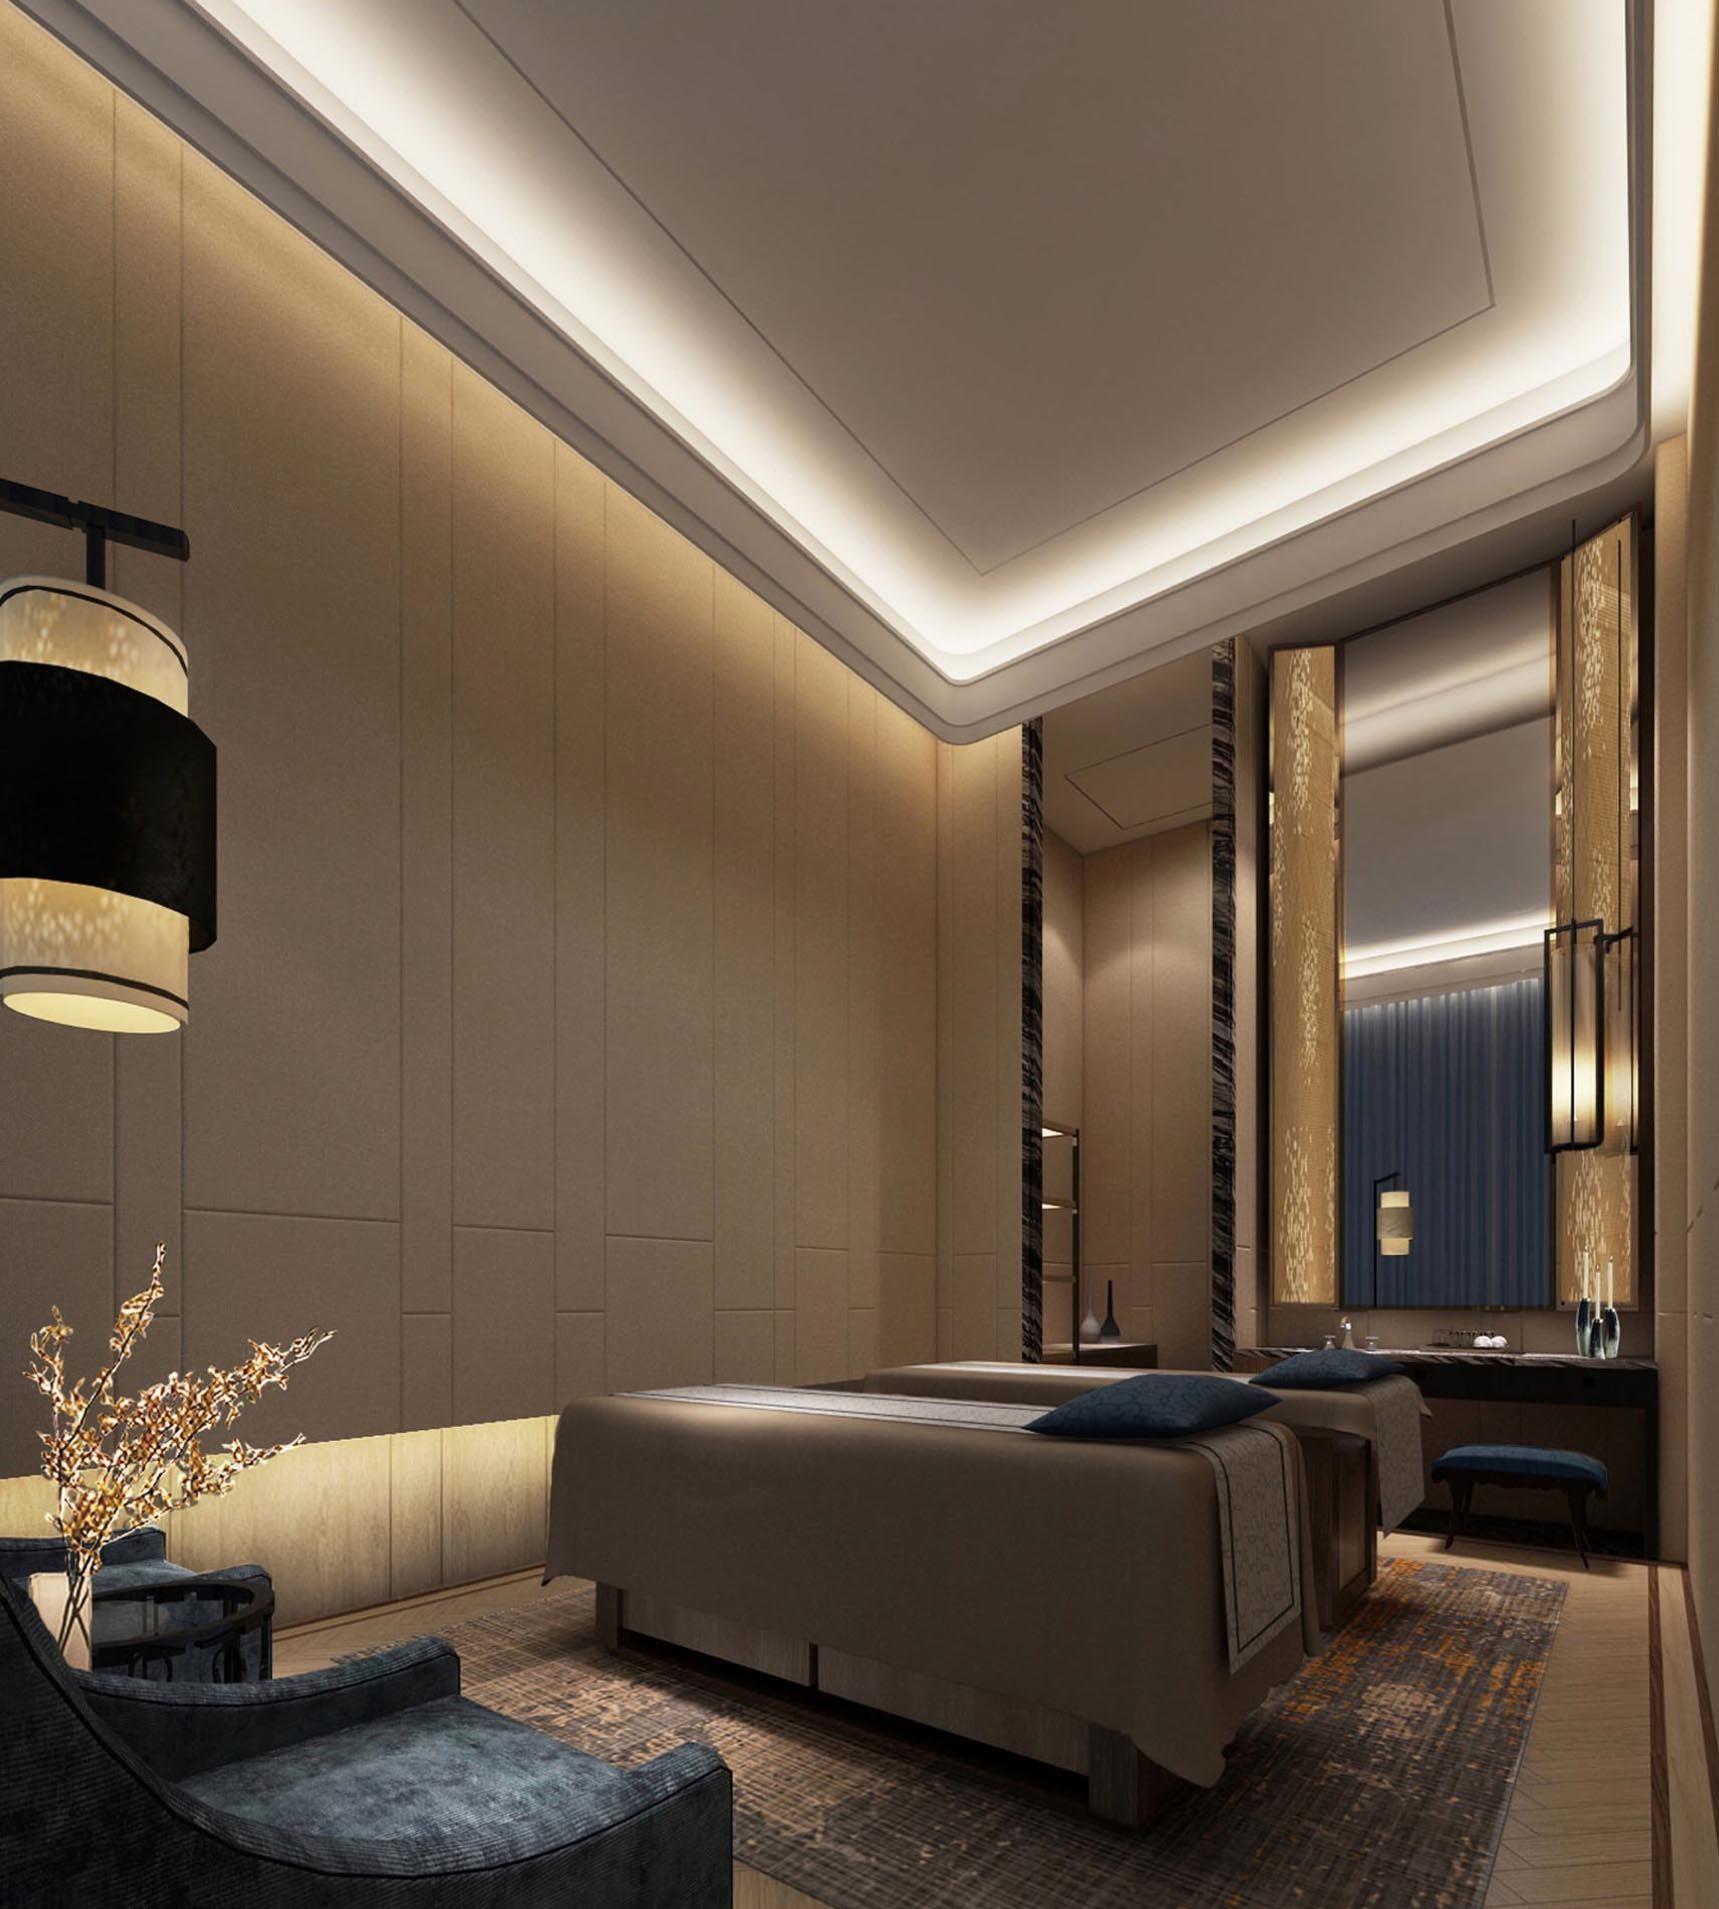 Thosarit Studio Spa Interior Spa Rooms Spa Treatment Room